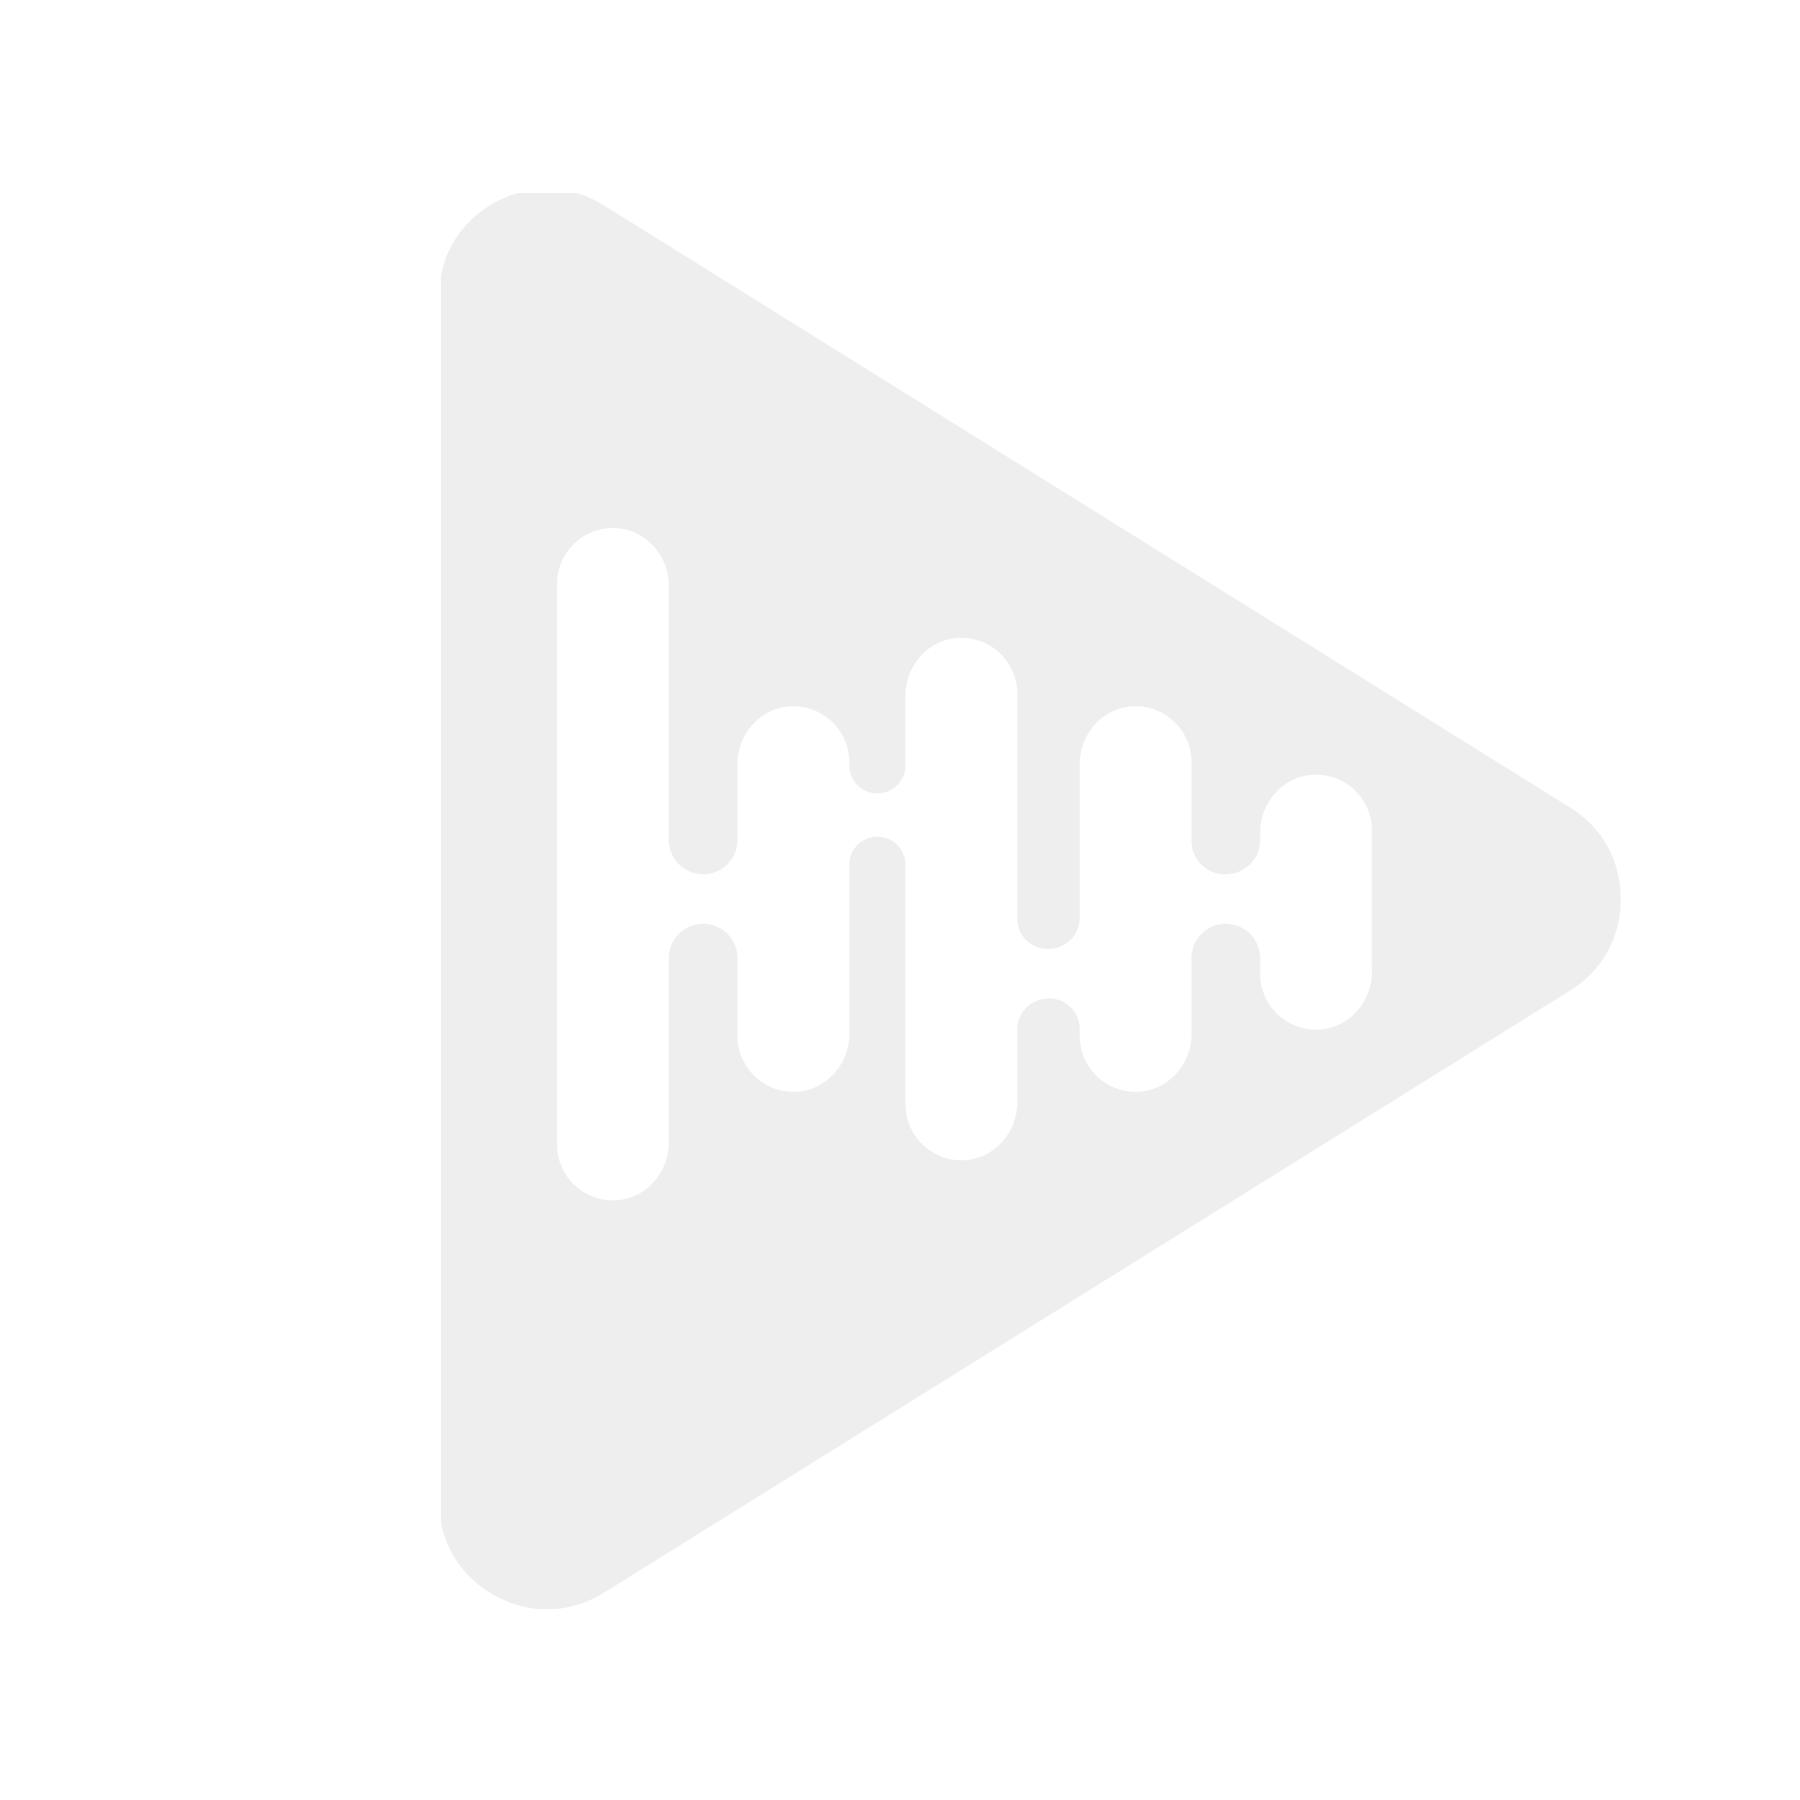 Klipsch 1011633 - Basshøyttaler, RS-42 II (Stk)